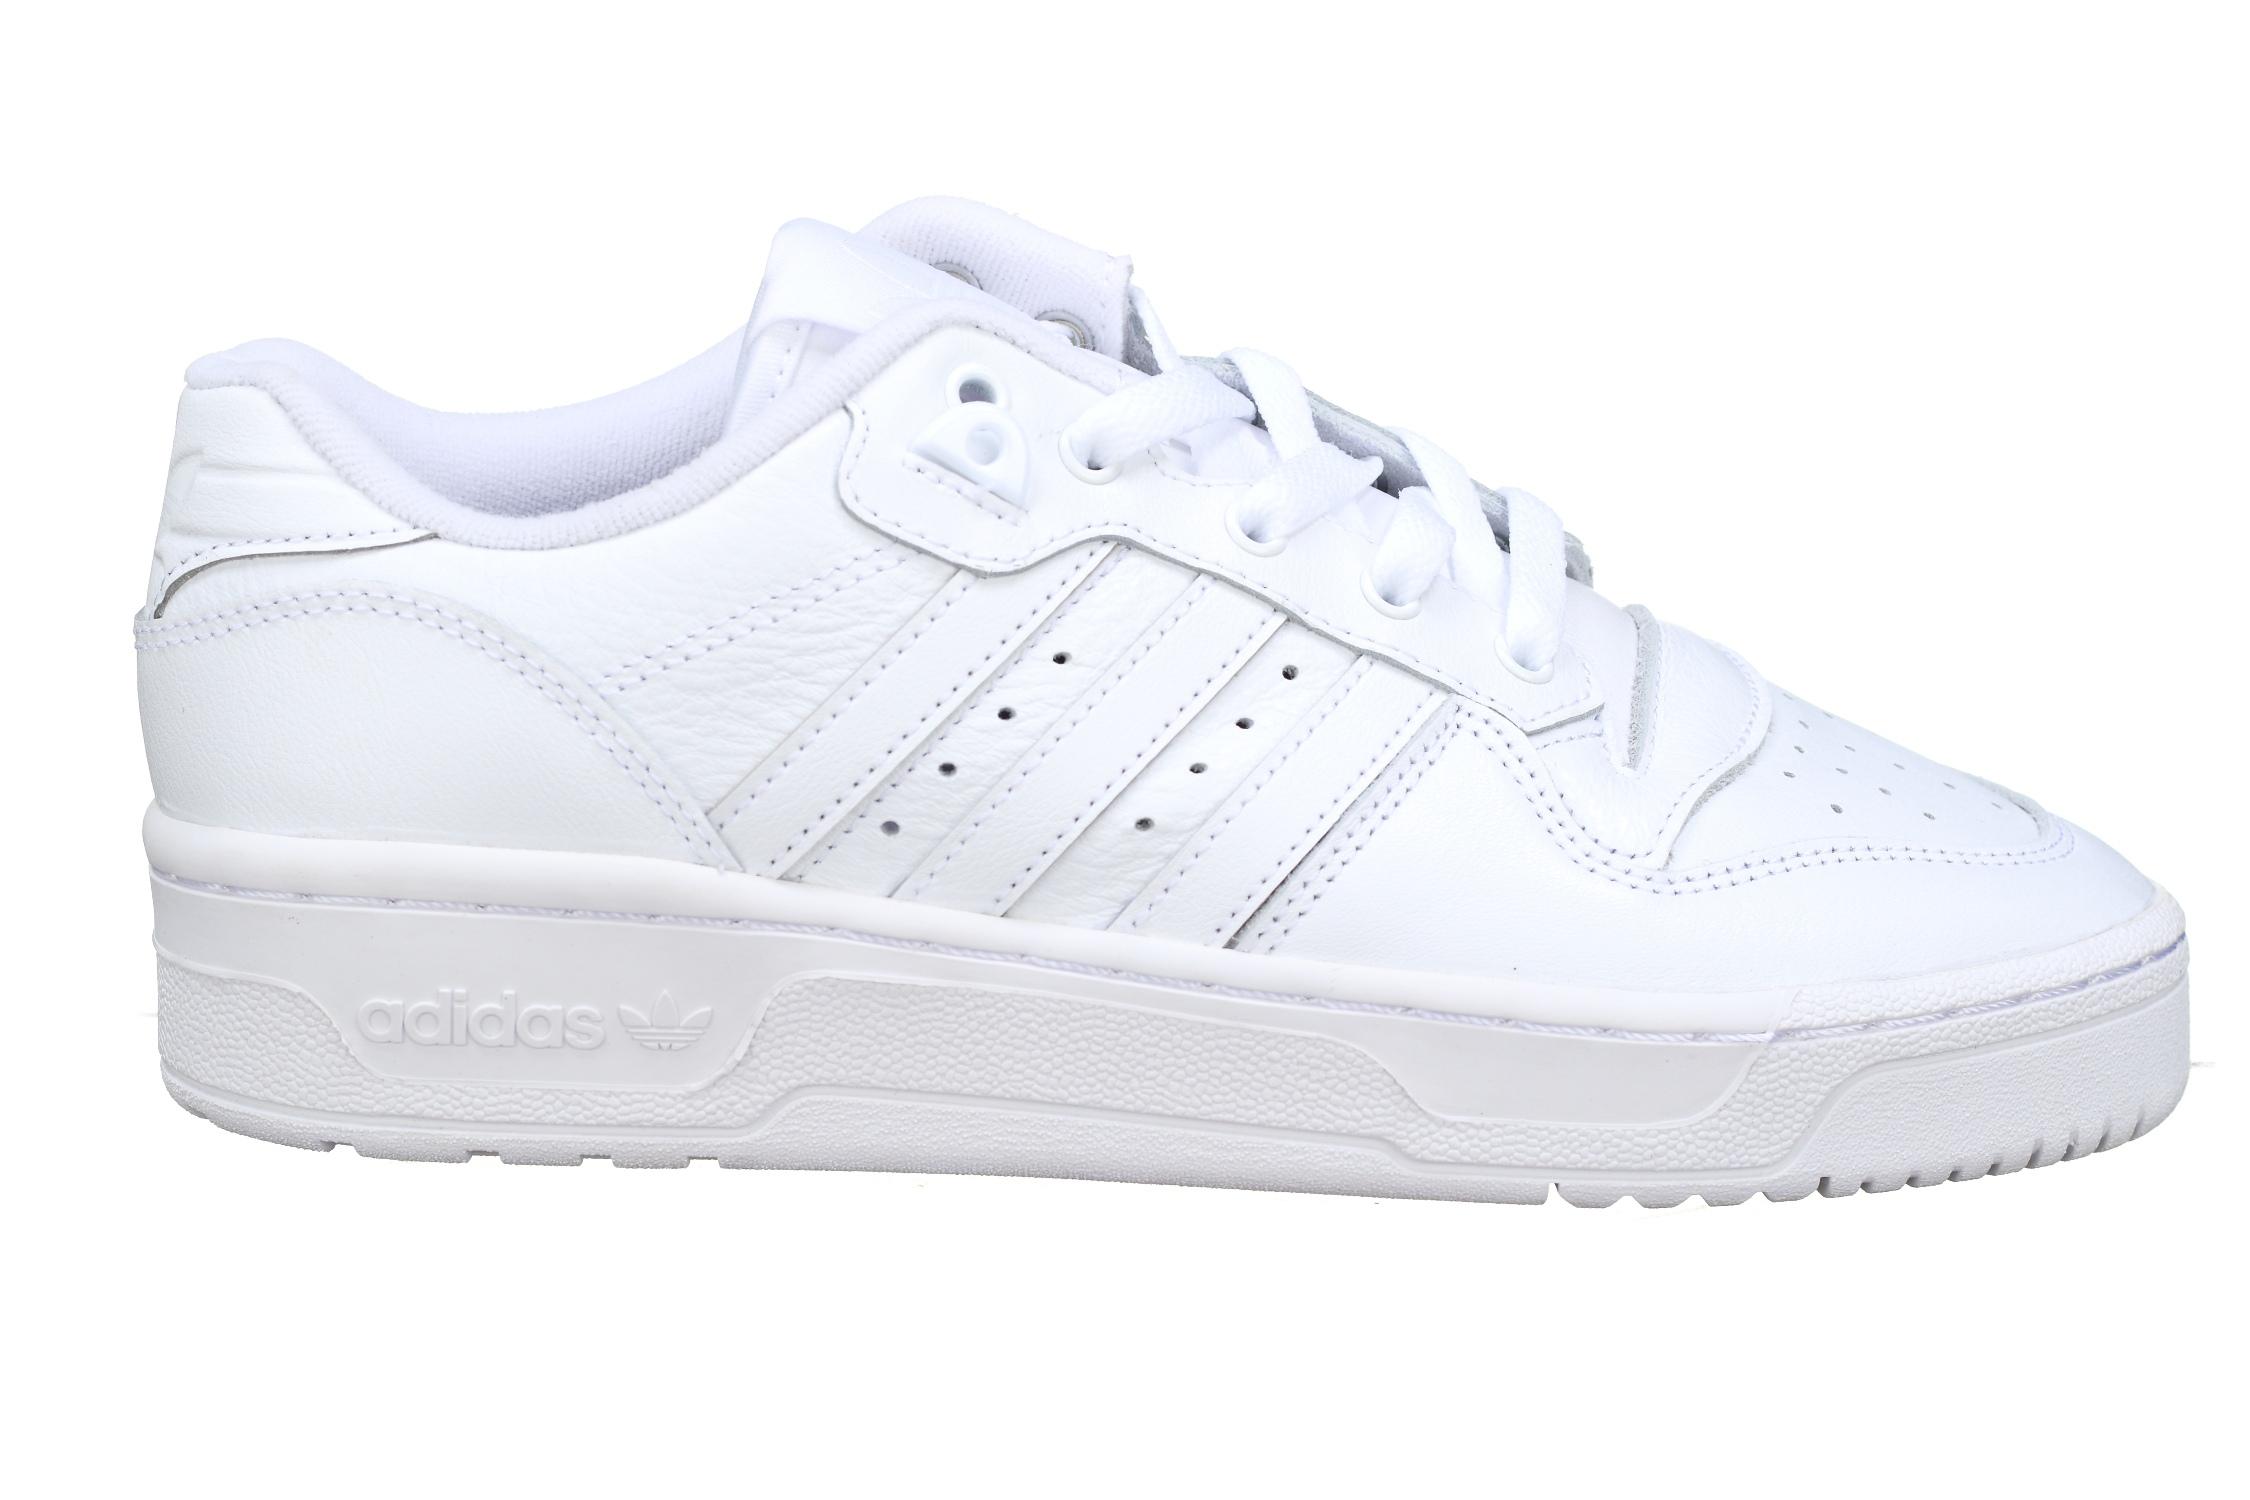 http://www.leadermode.com/176102/adidas-rivalry-low-ef8729-white.jpg